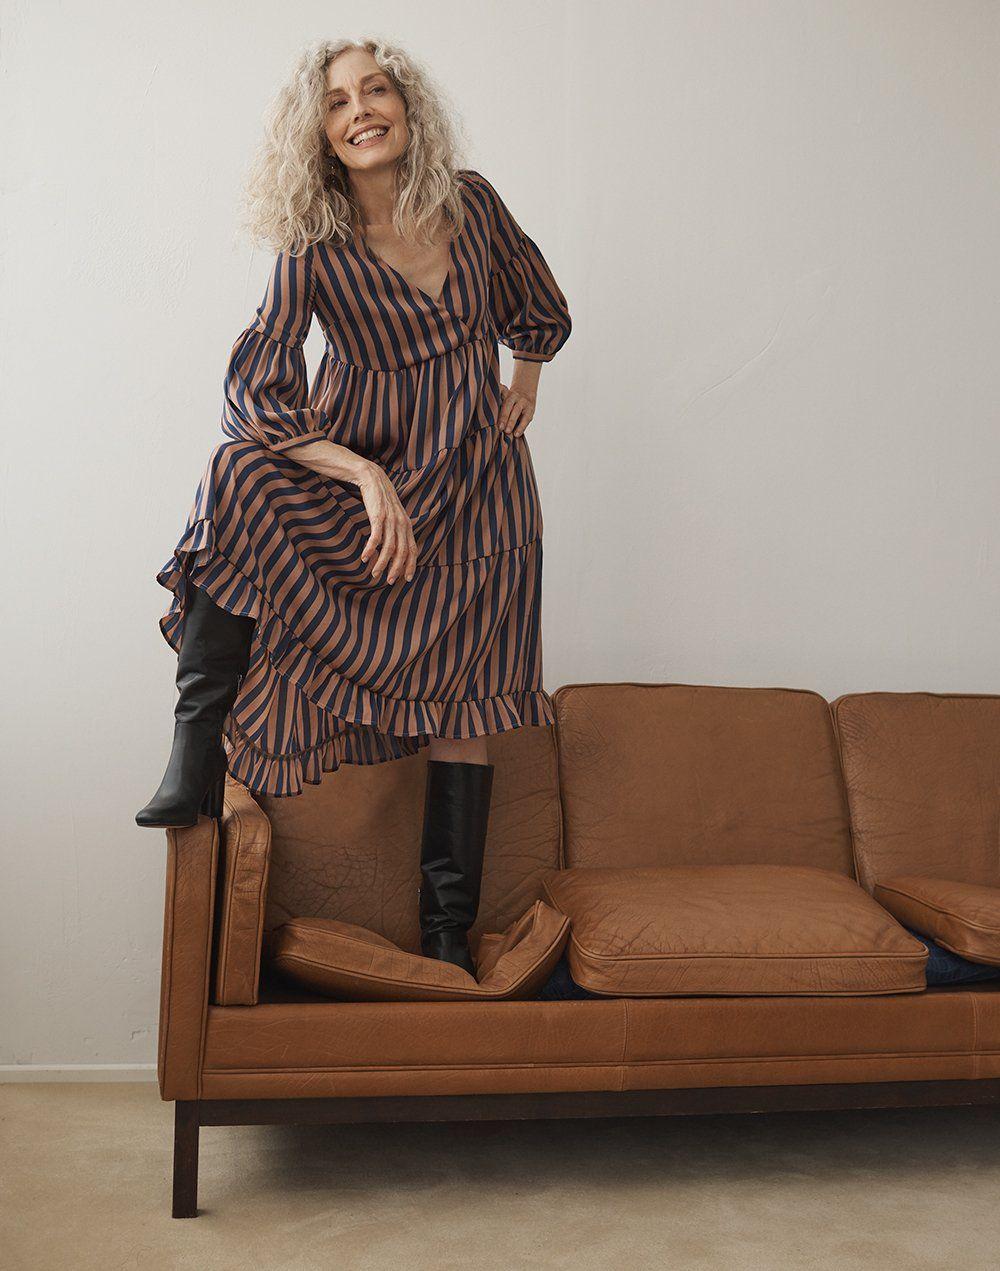 madewell scarlett tall boot worn with striped satin midi dress ... 164cde0a10a6